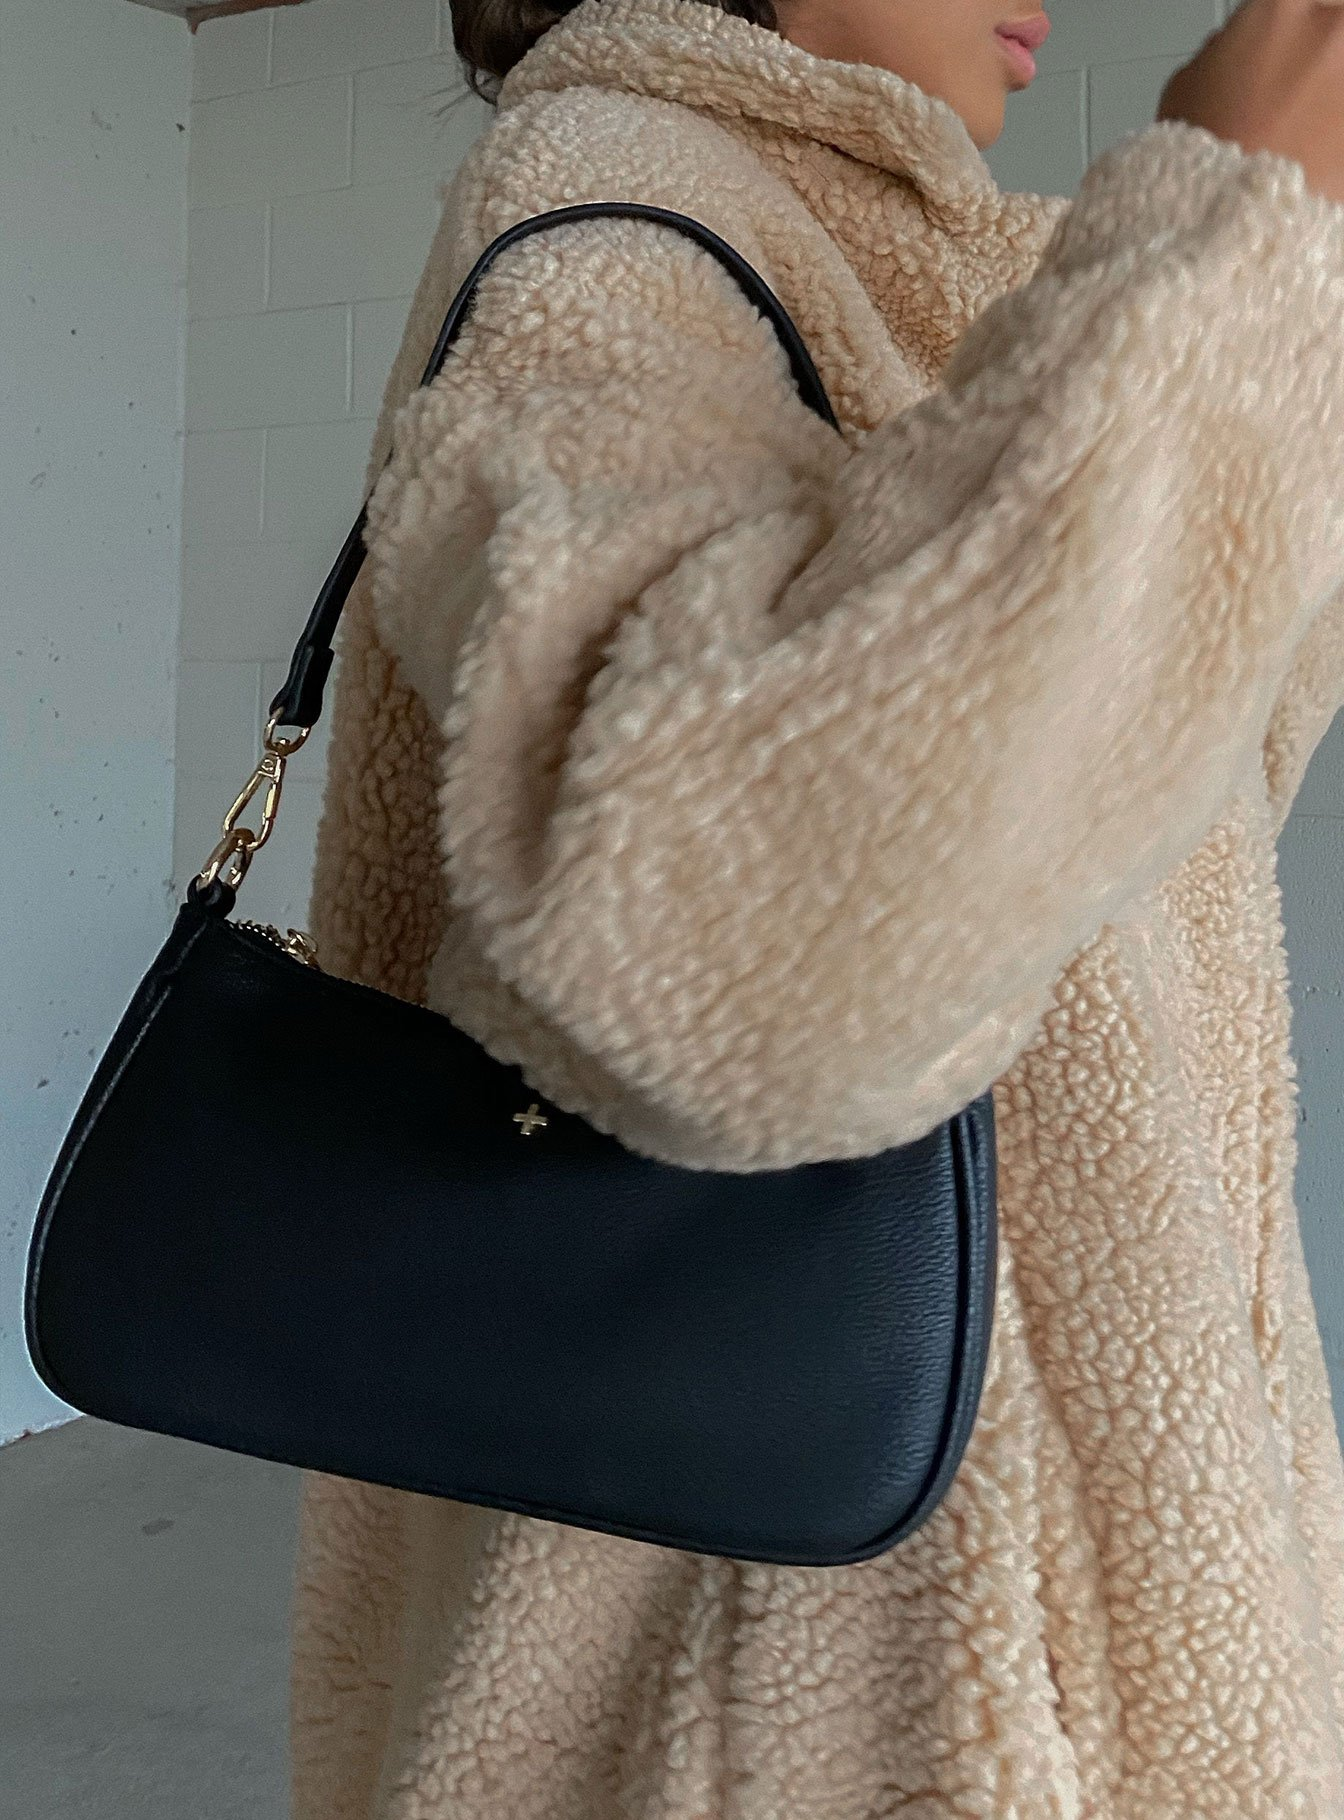 Bags & Wallets (Side A)